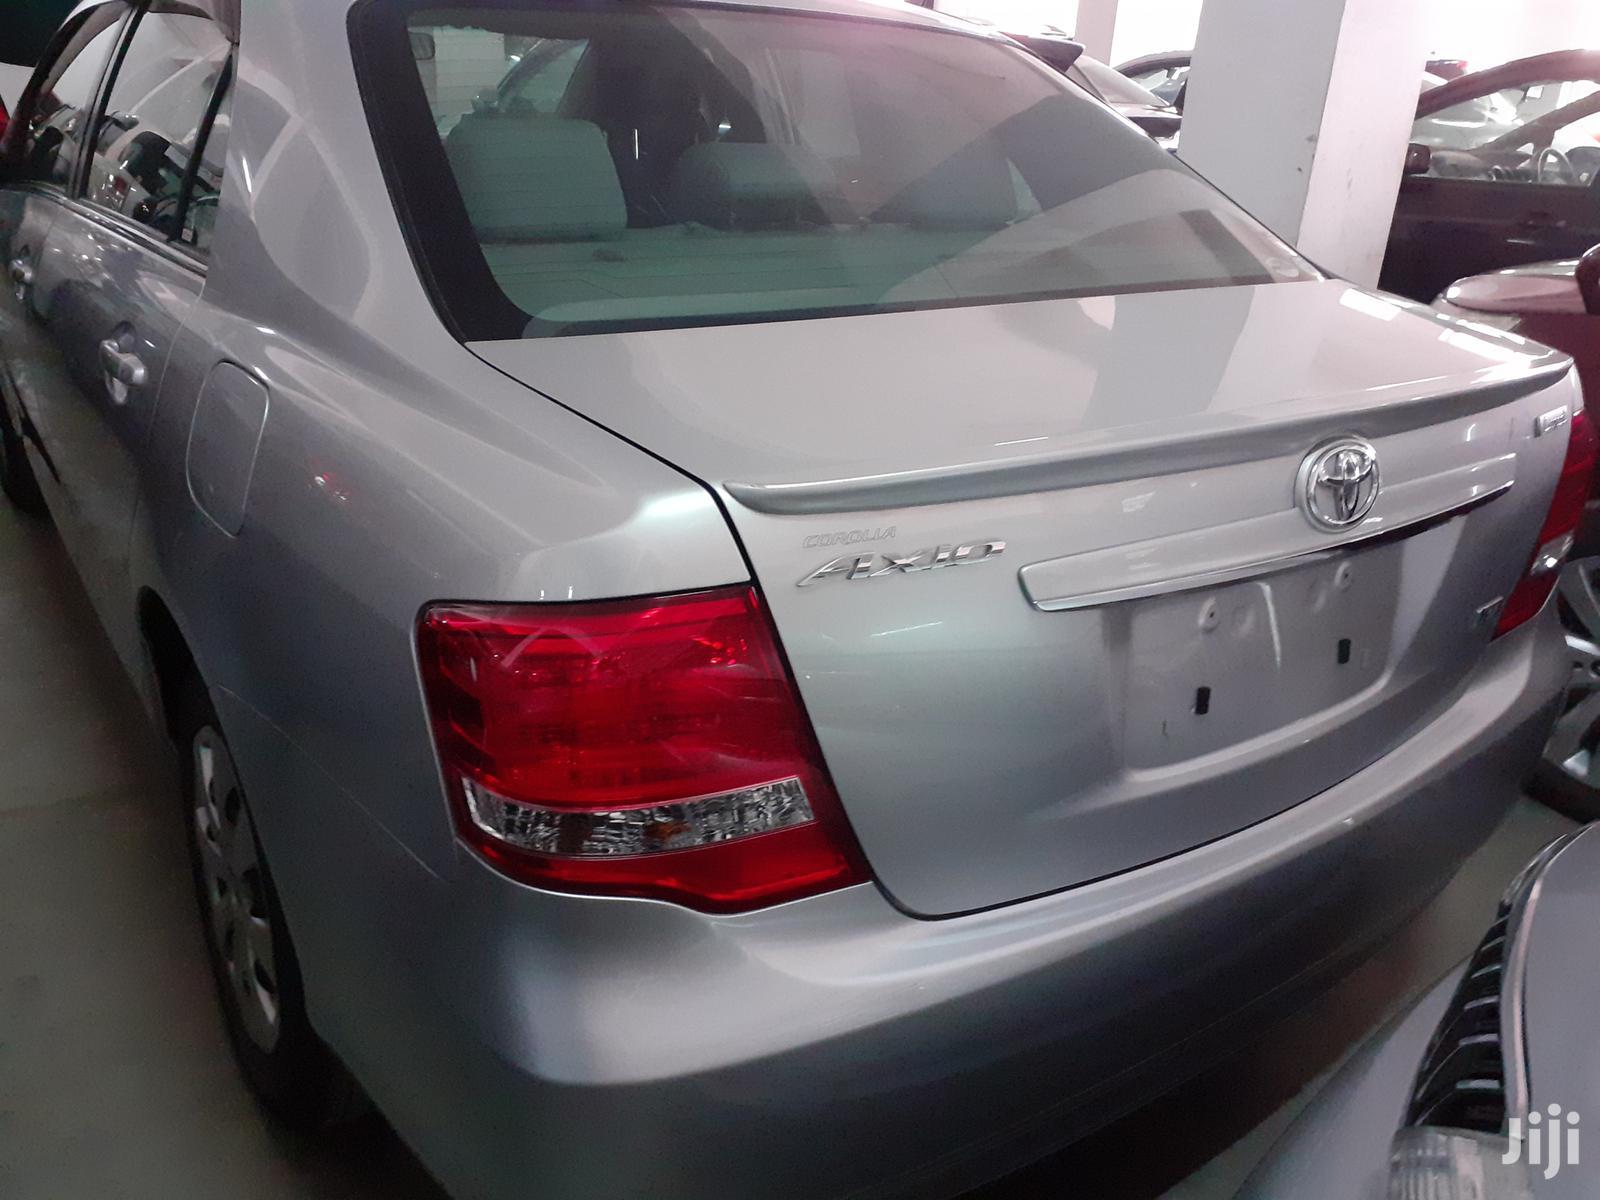 Toyota Corolla 2012 Silver | Cars for sale in Mvita, Majengo, Kenya